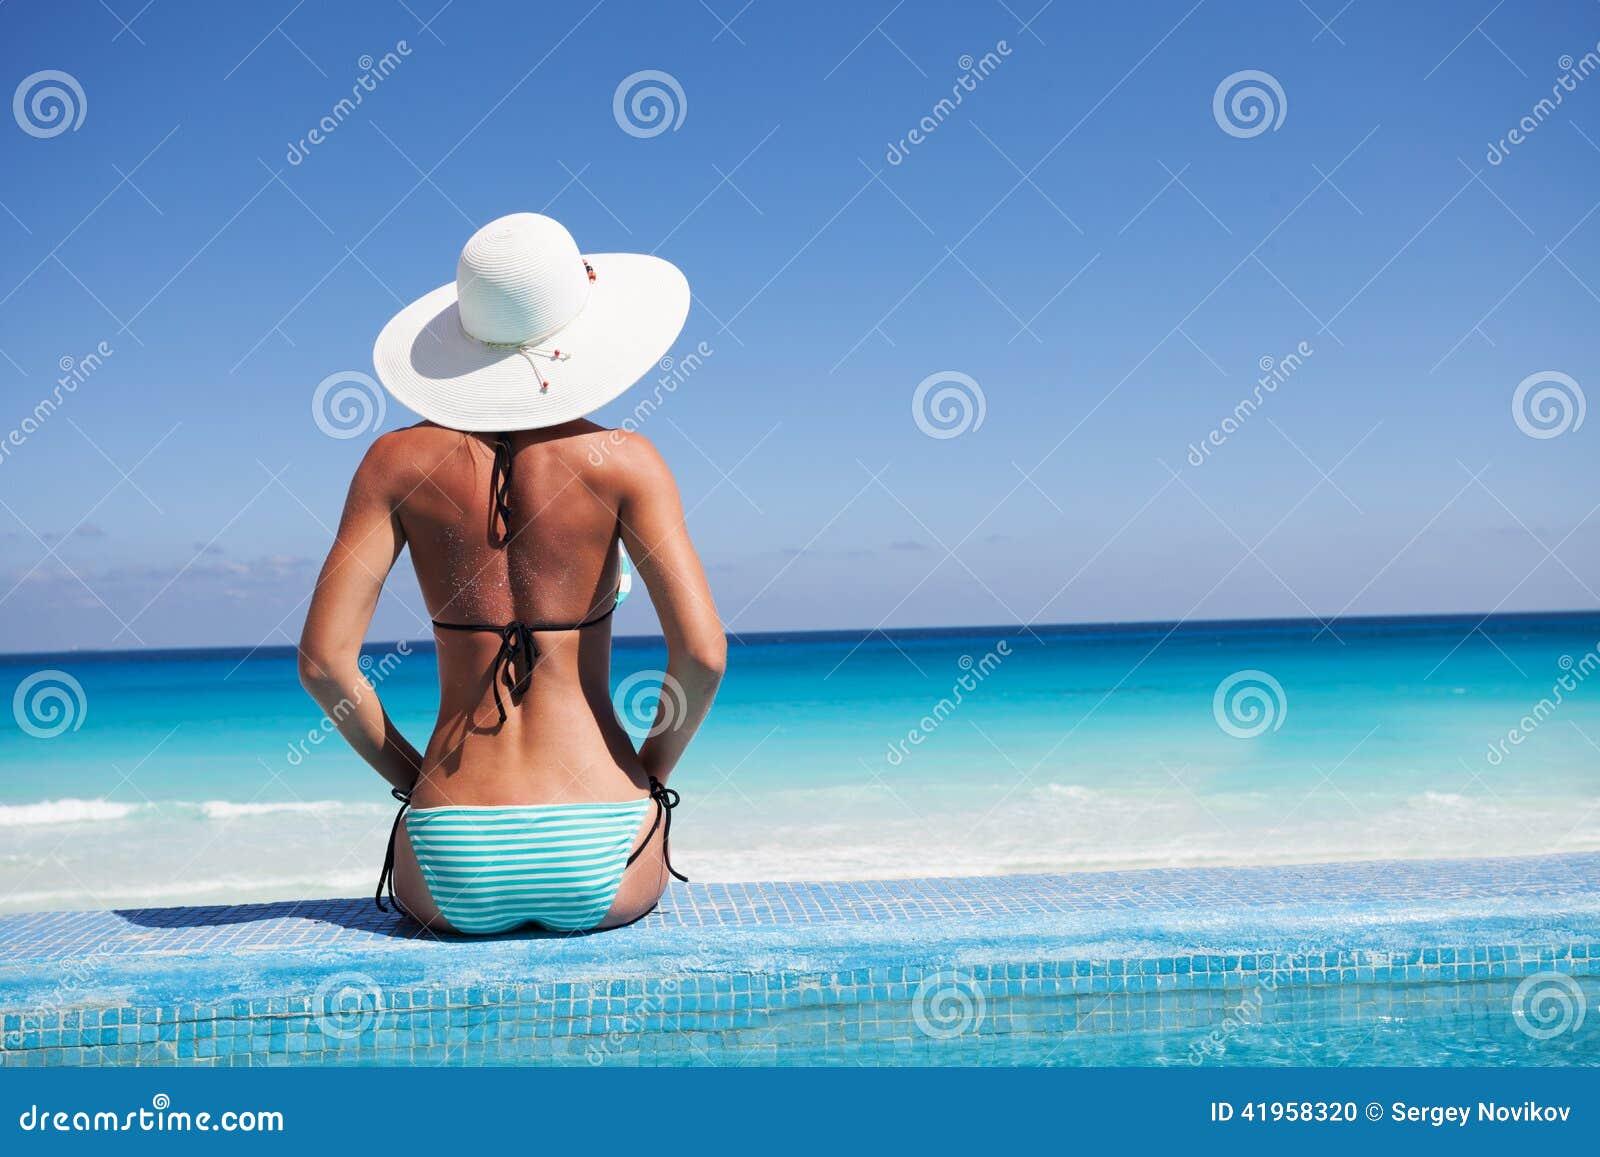 Want them beach hat